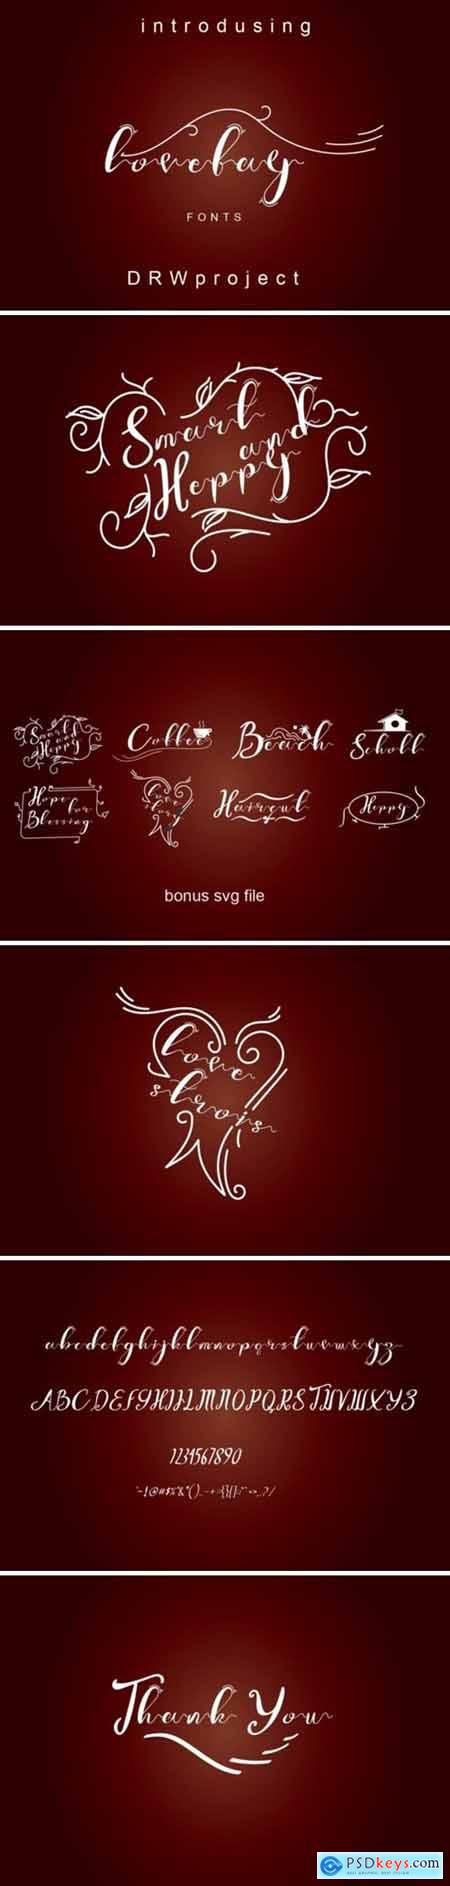 Lovelay Font